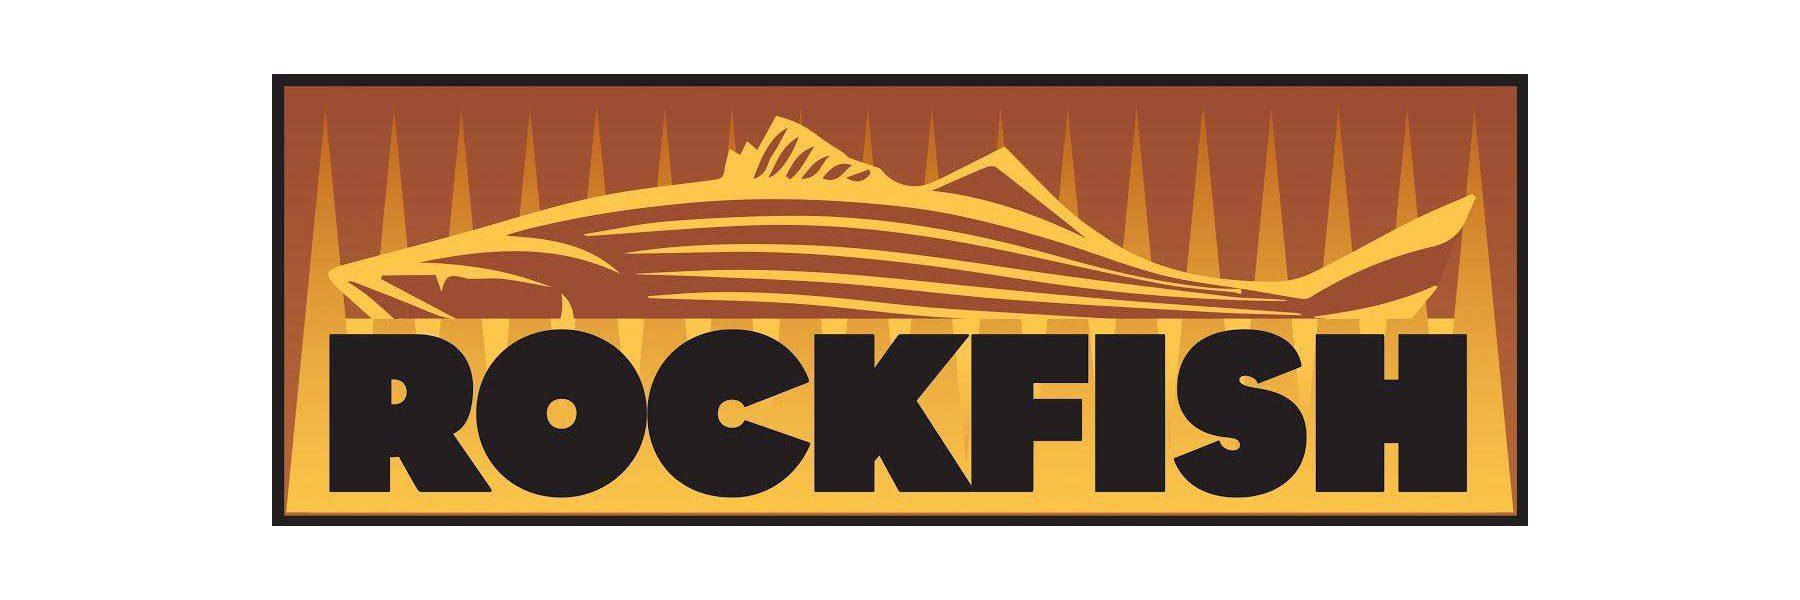 rockfishedgartown.com